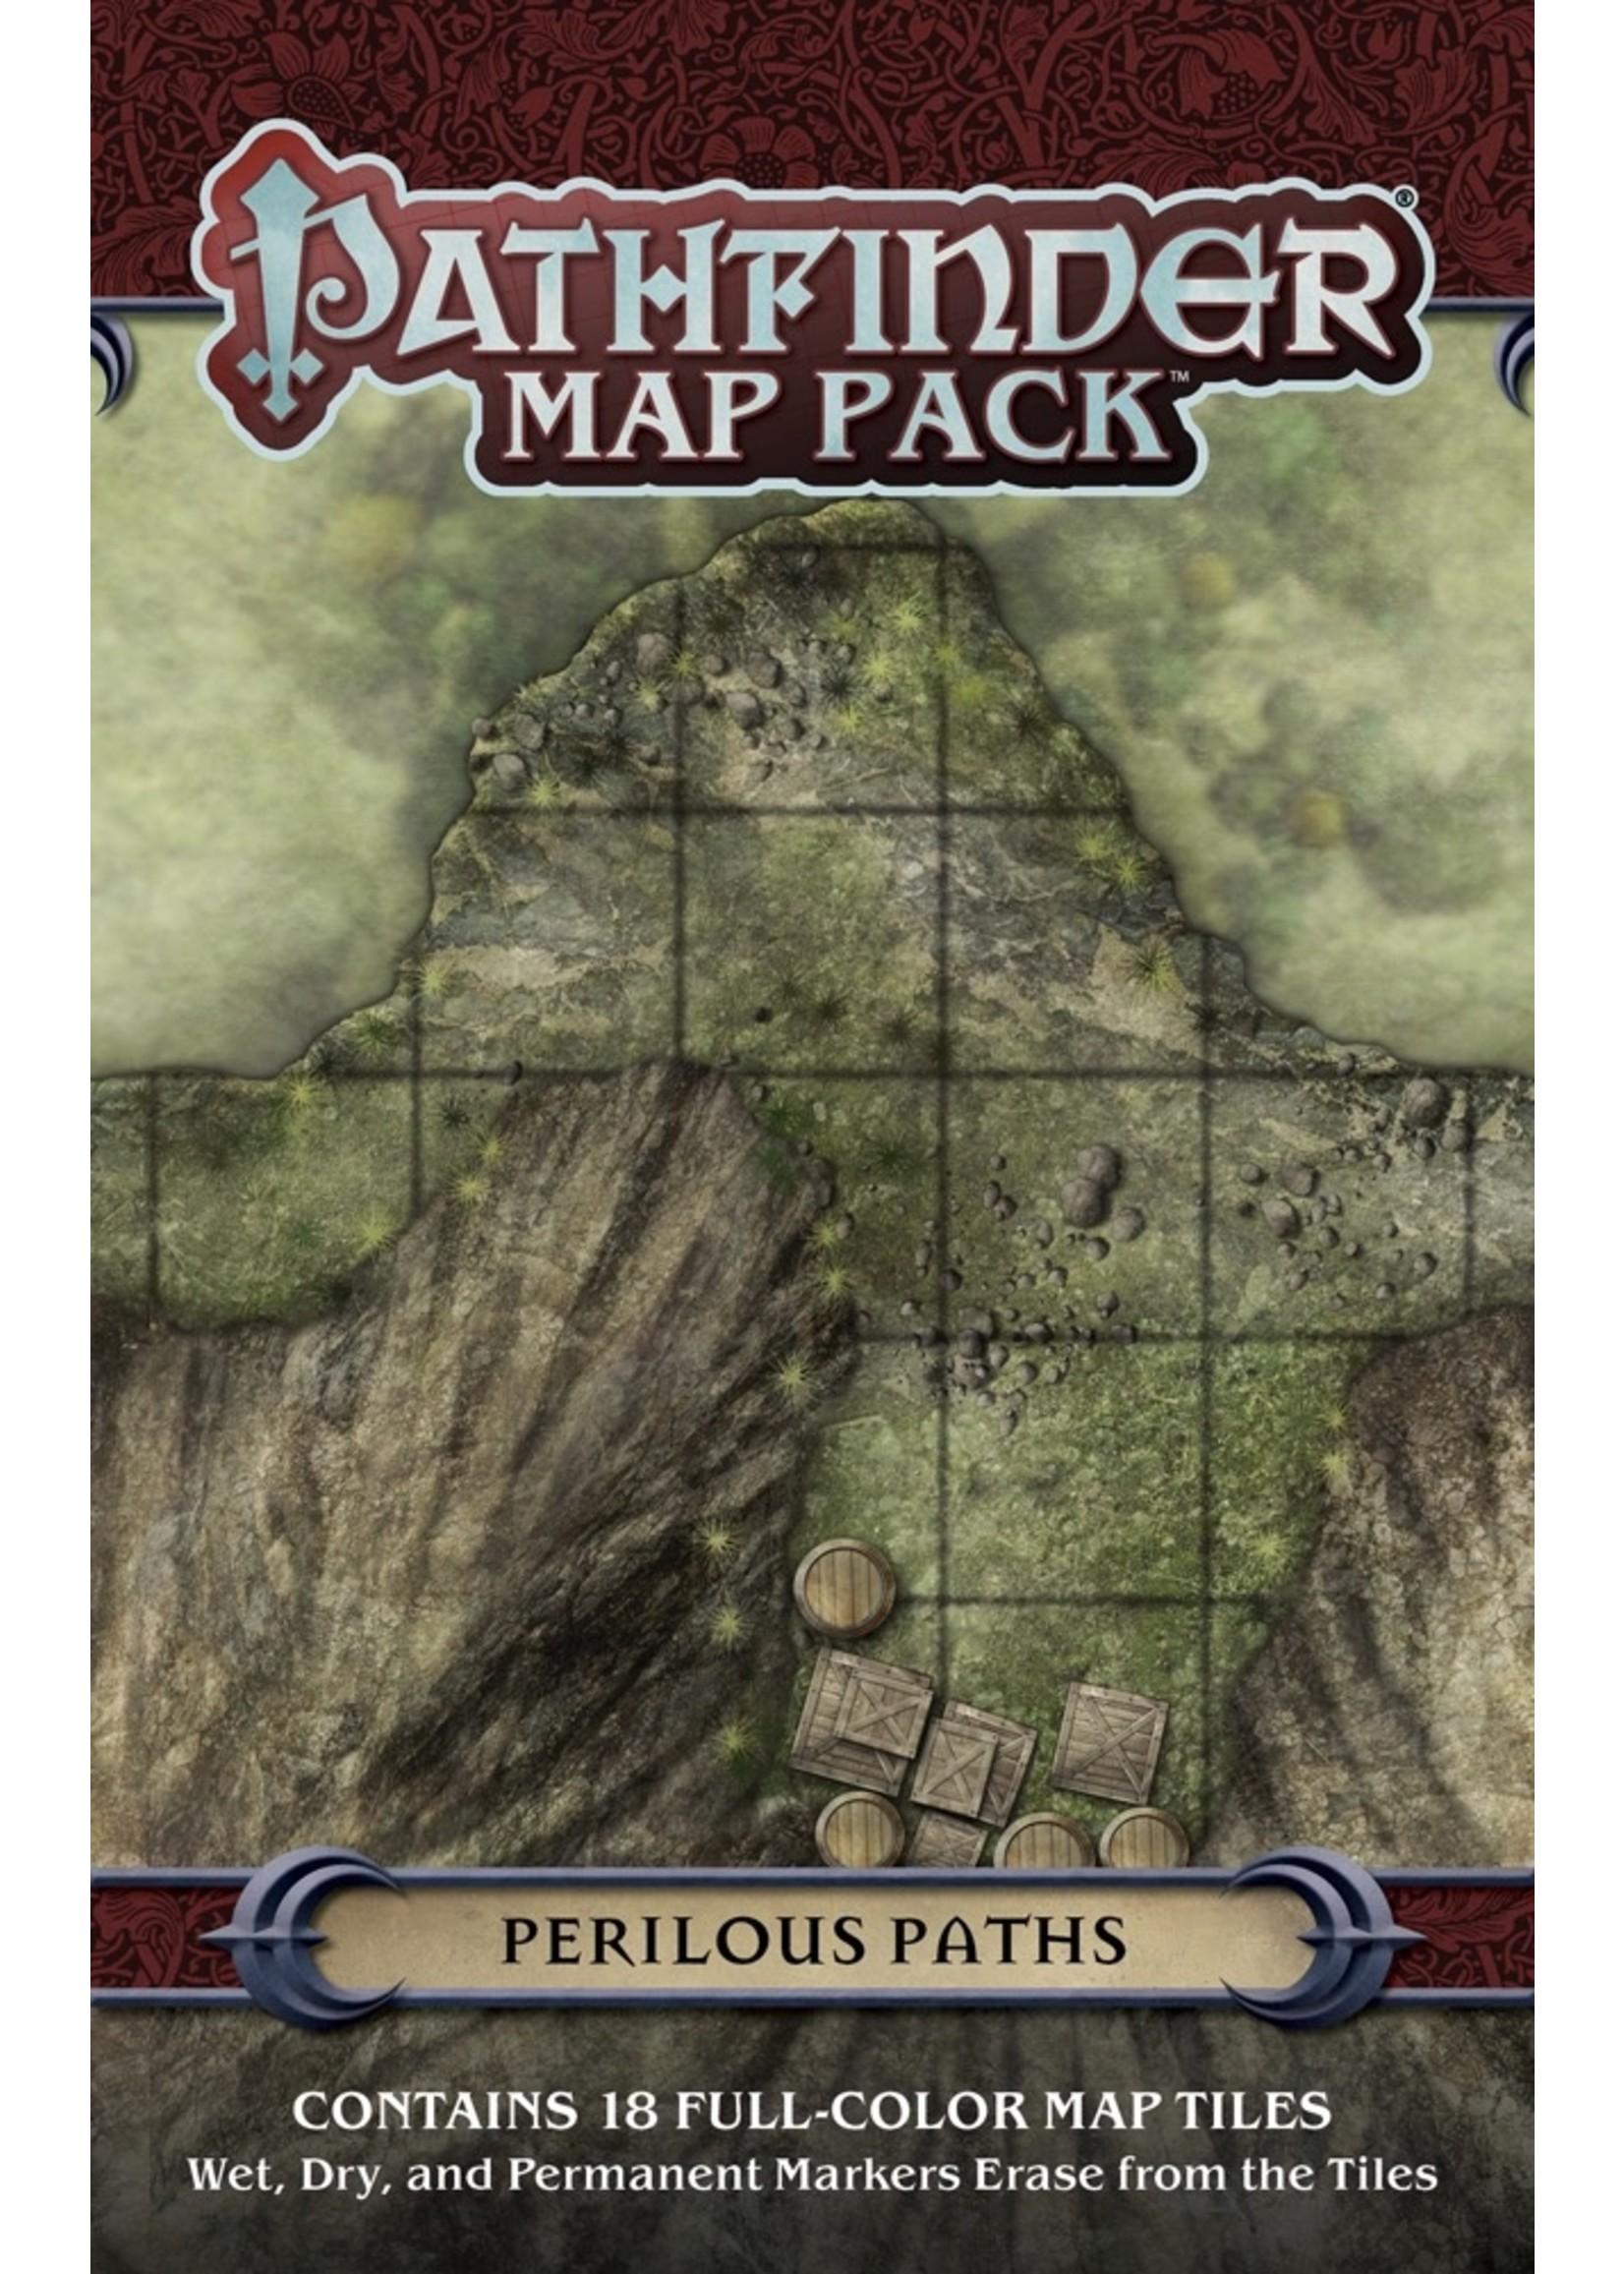 Pathfinder RPG: Map Pack - Perilous Paths